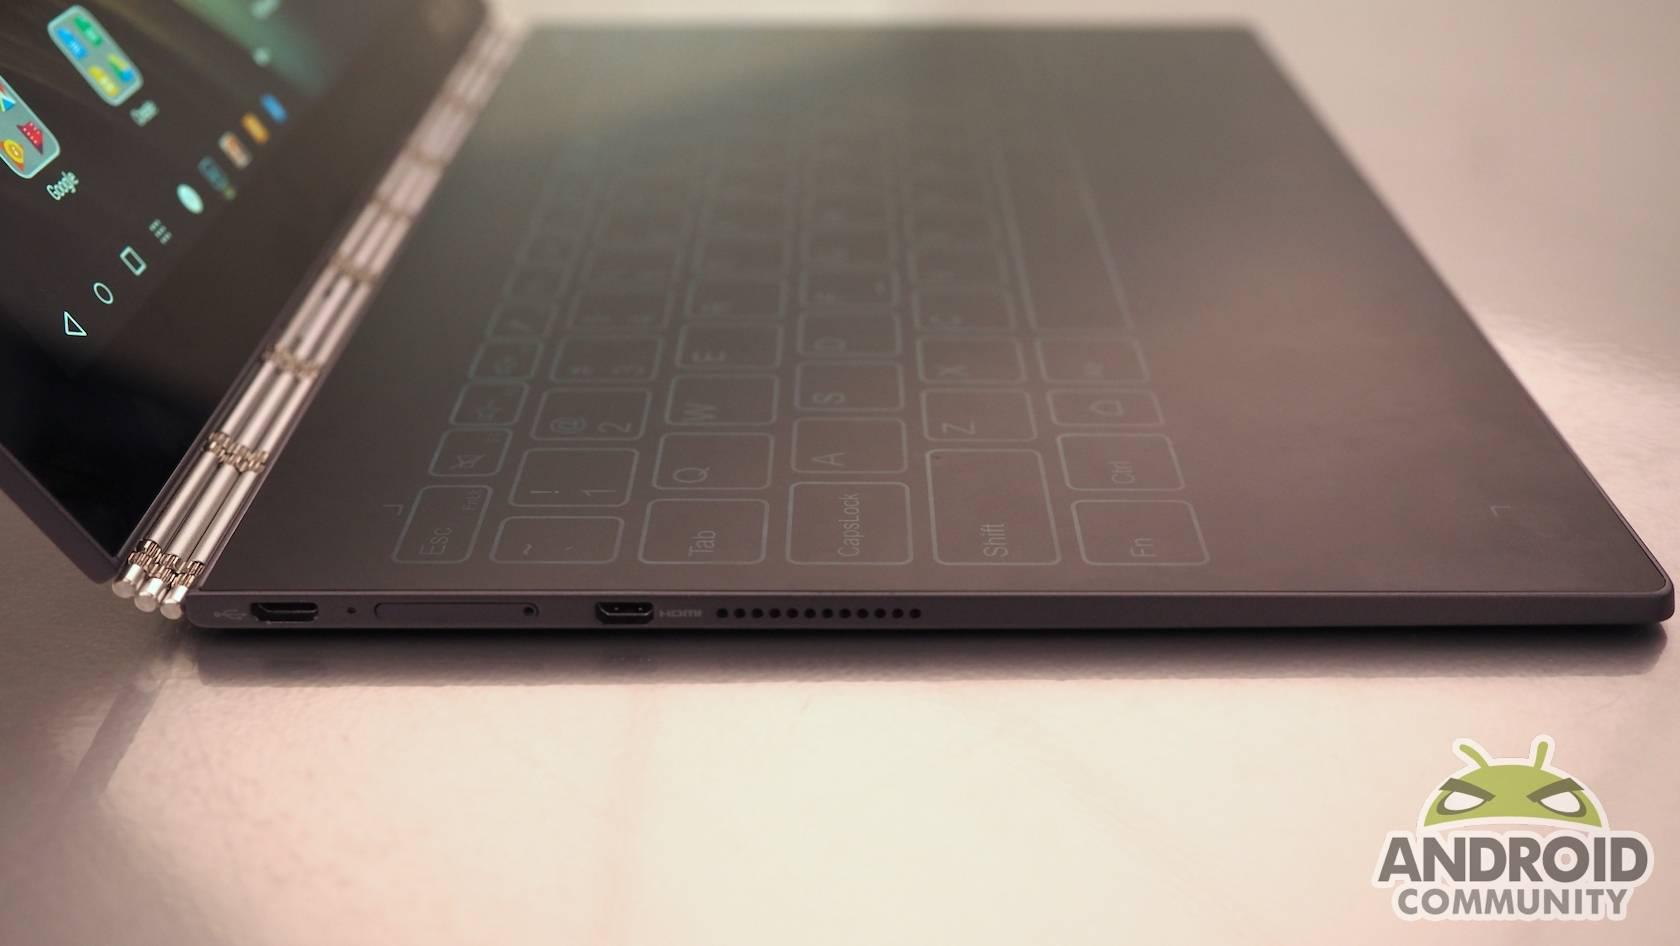 Lenovo Yoga Book hands-on: an odd blend of digital and